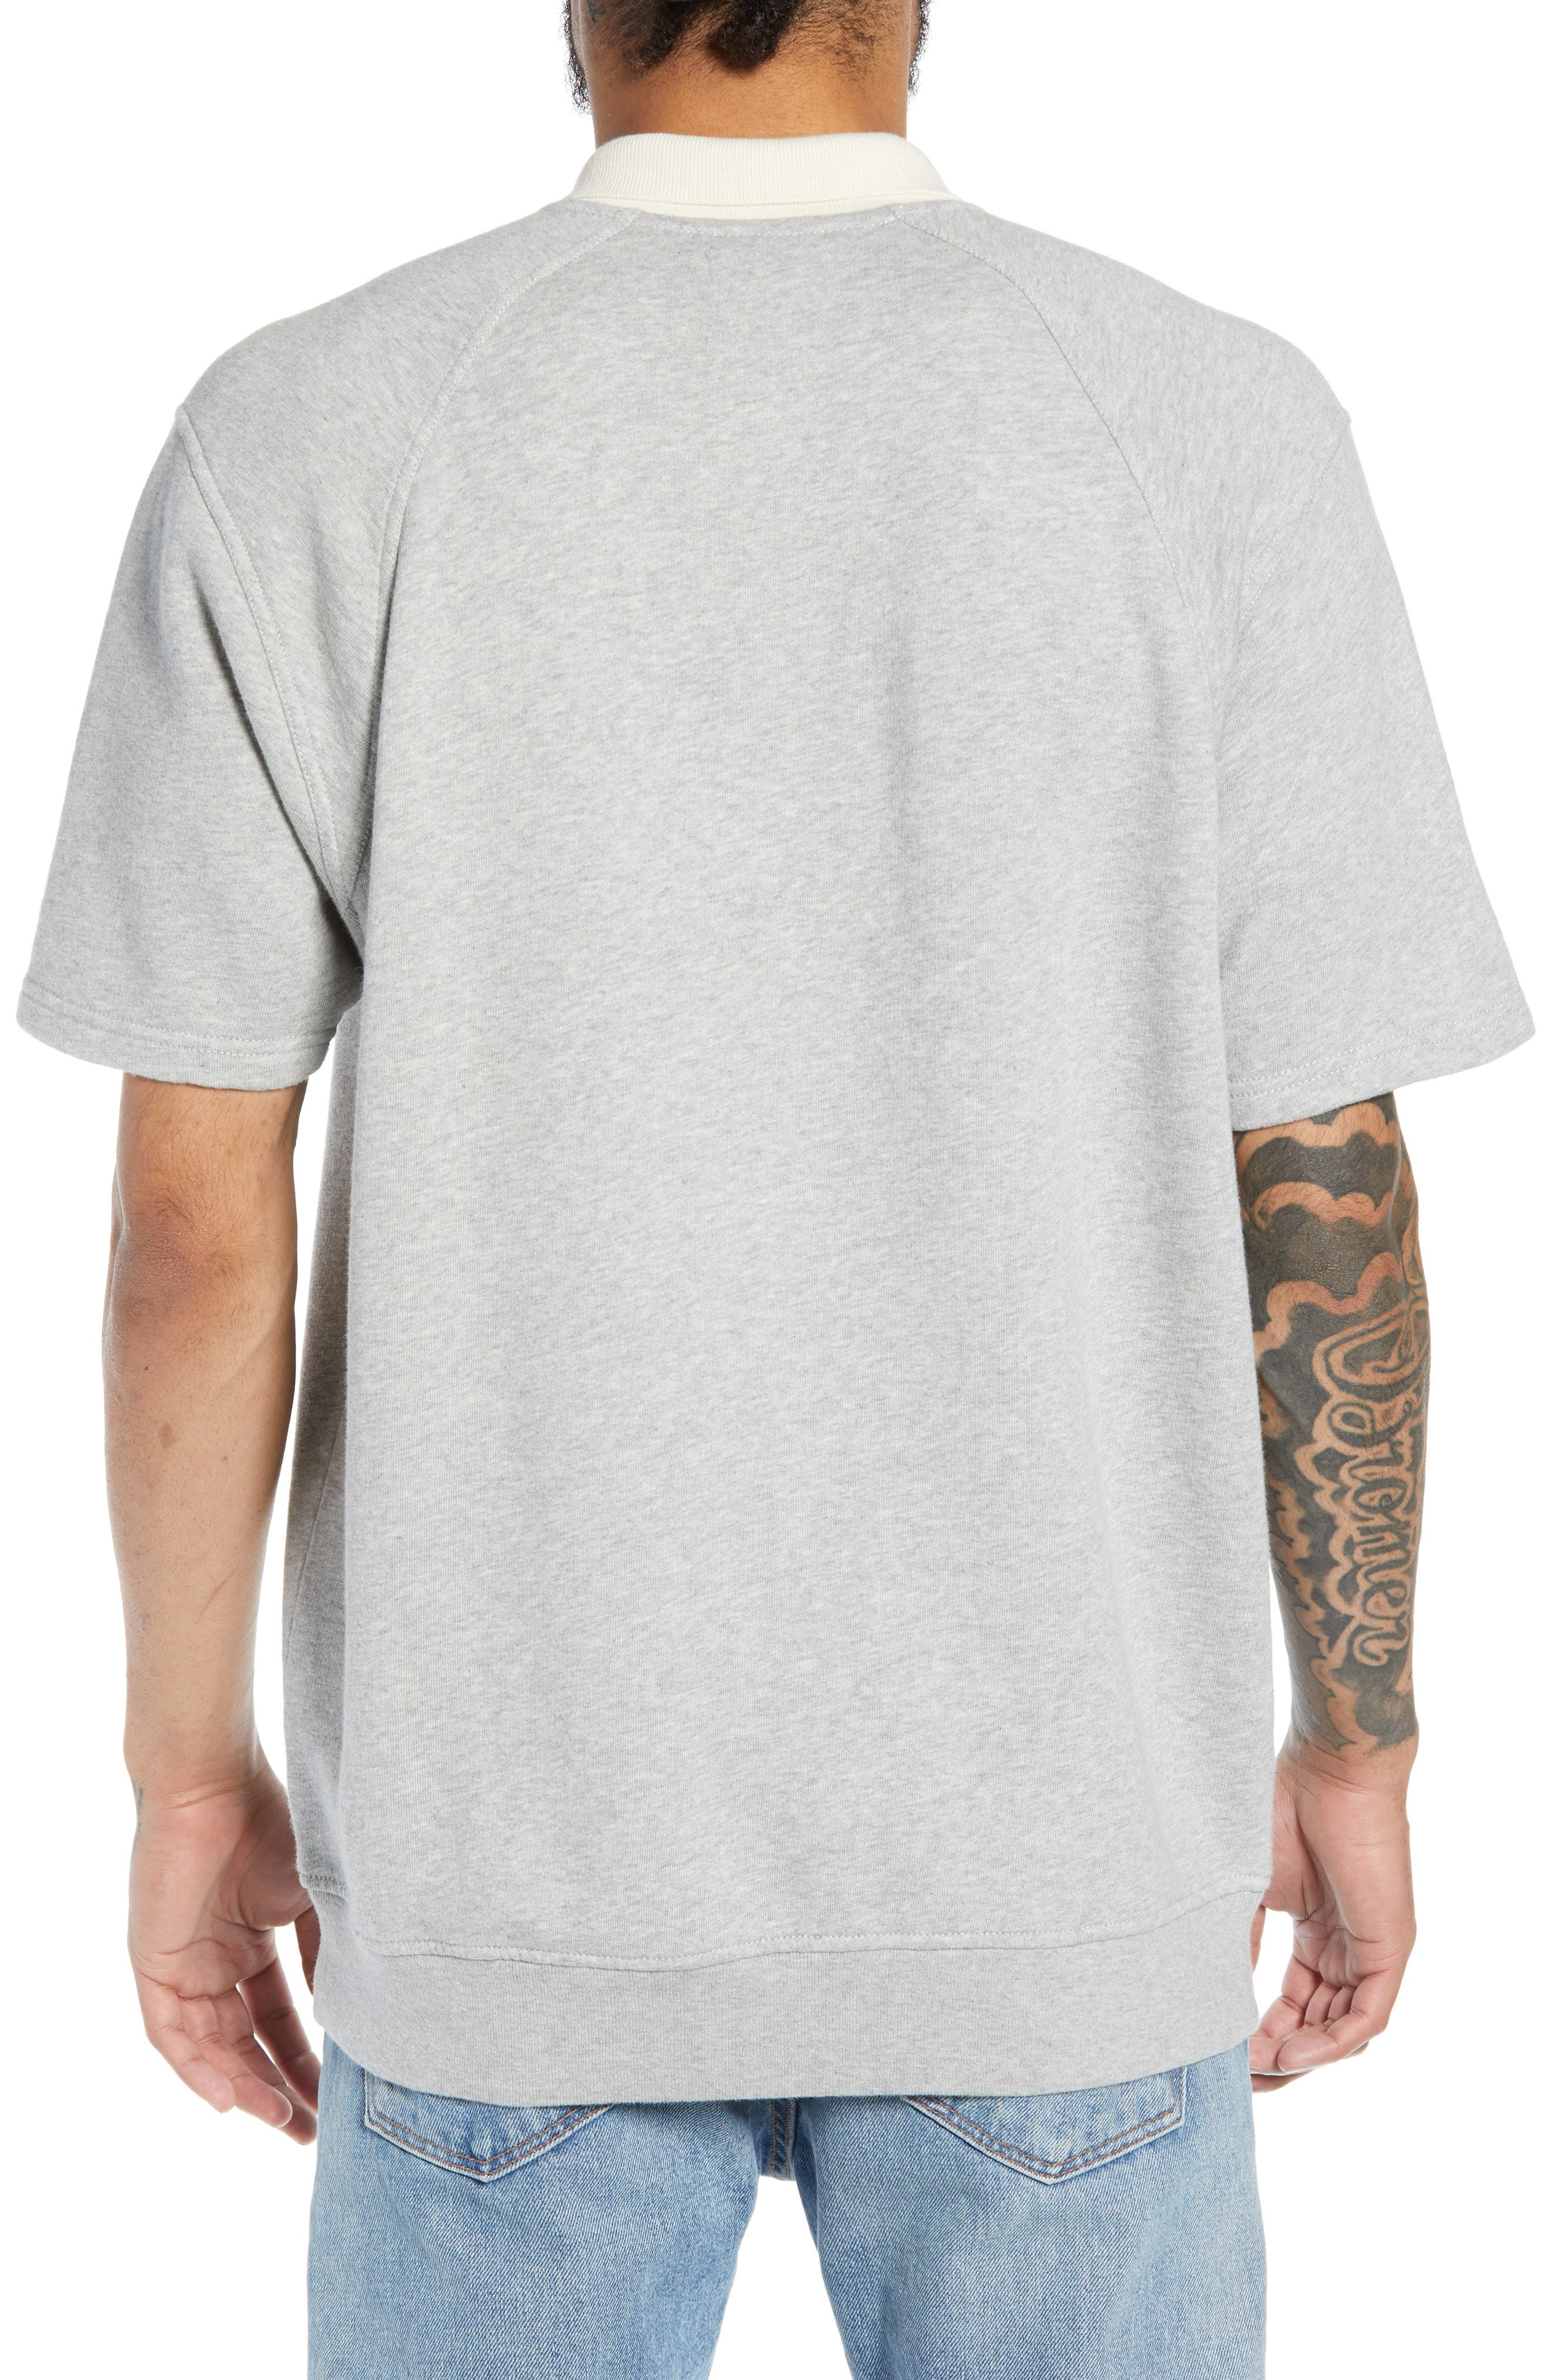 THE RAIL, Short Sleeve Rugby Shirt, Alternate thumbnail 2, color, GREY ASH HEATHER